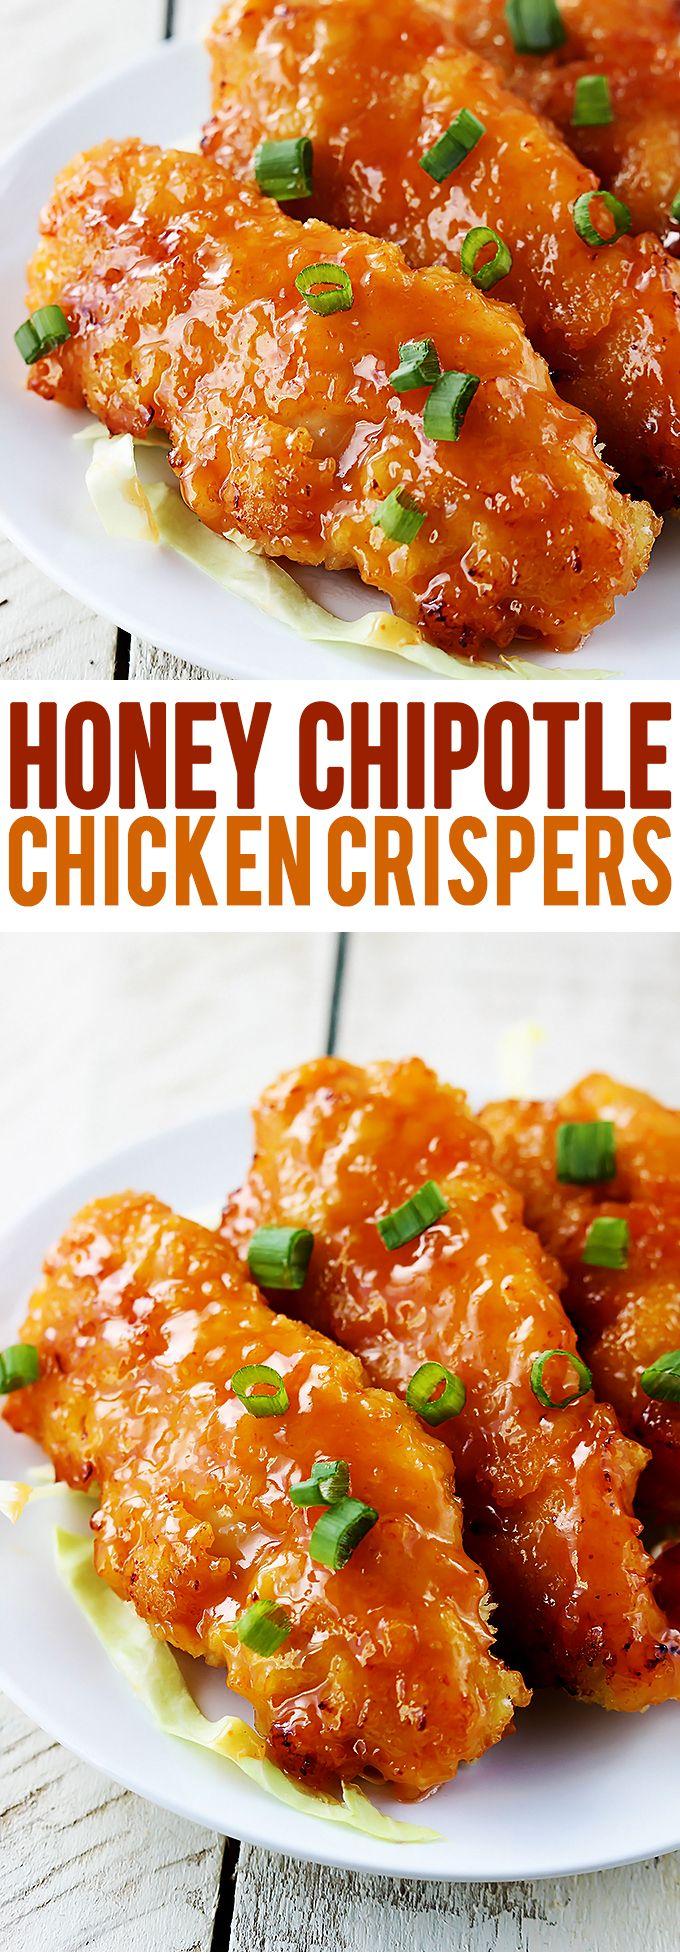 Honey Chipotle Chicken Crispers